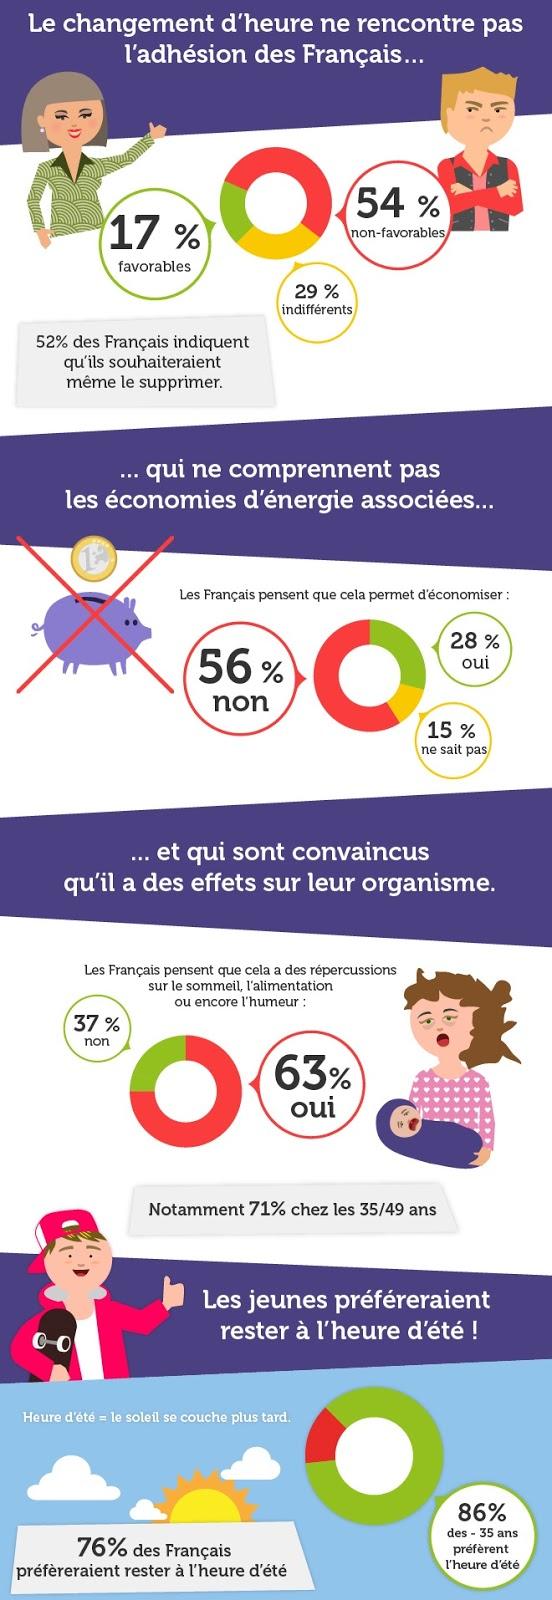 http://media.comprendrechoisir.com/usage=source:orientation=source/Infographie-heure-mars-16